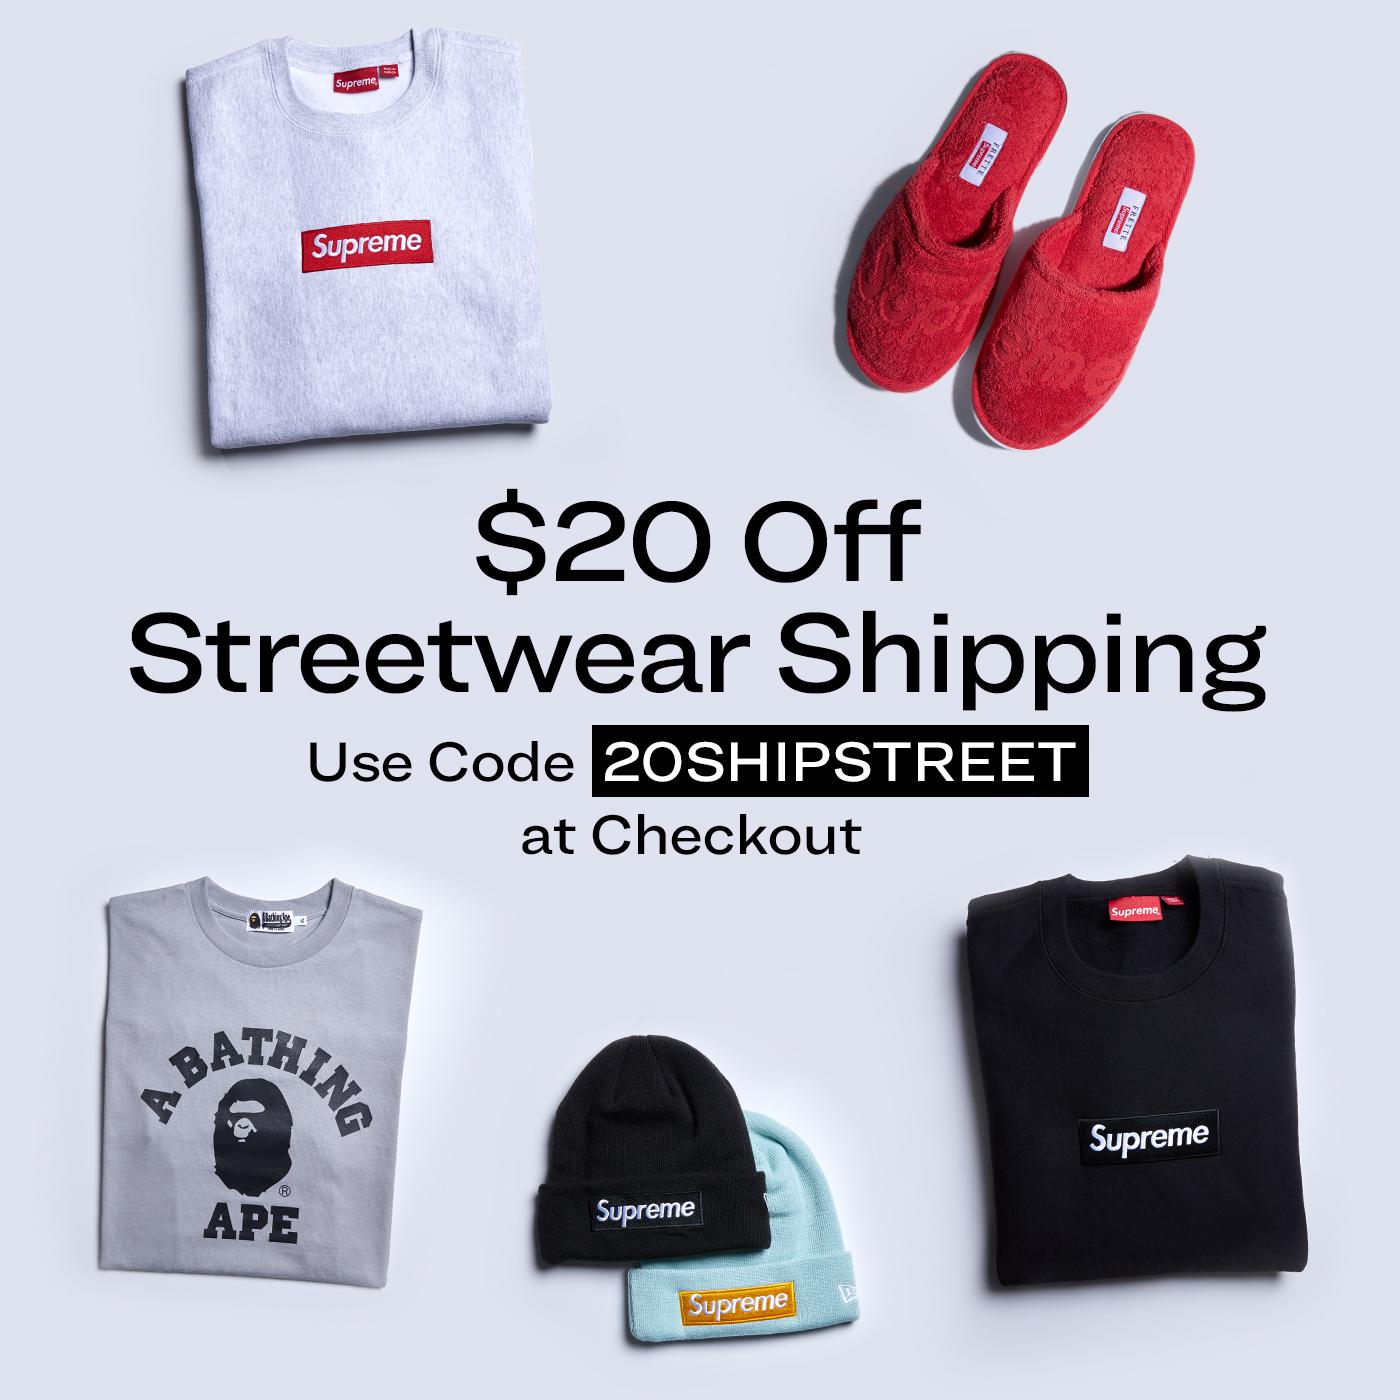 Half Off Streetwear Shipping Fees